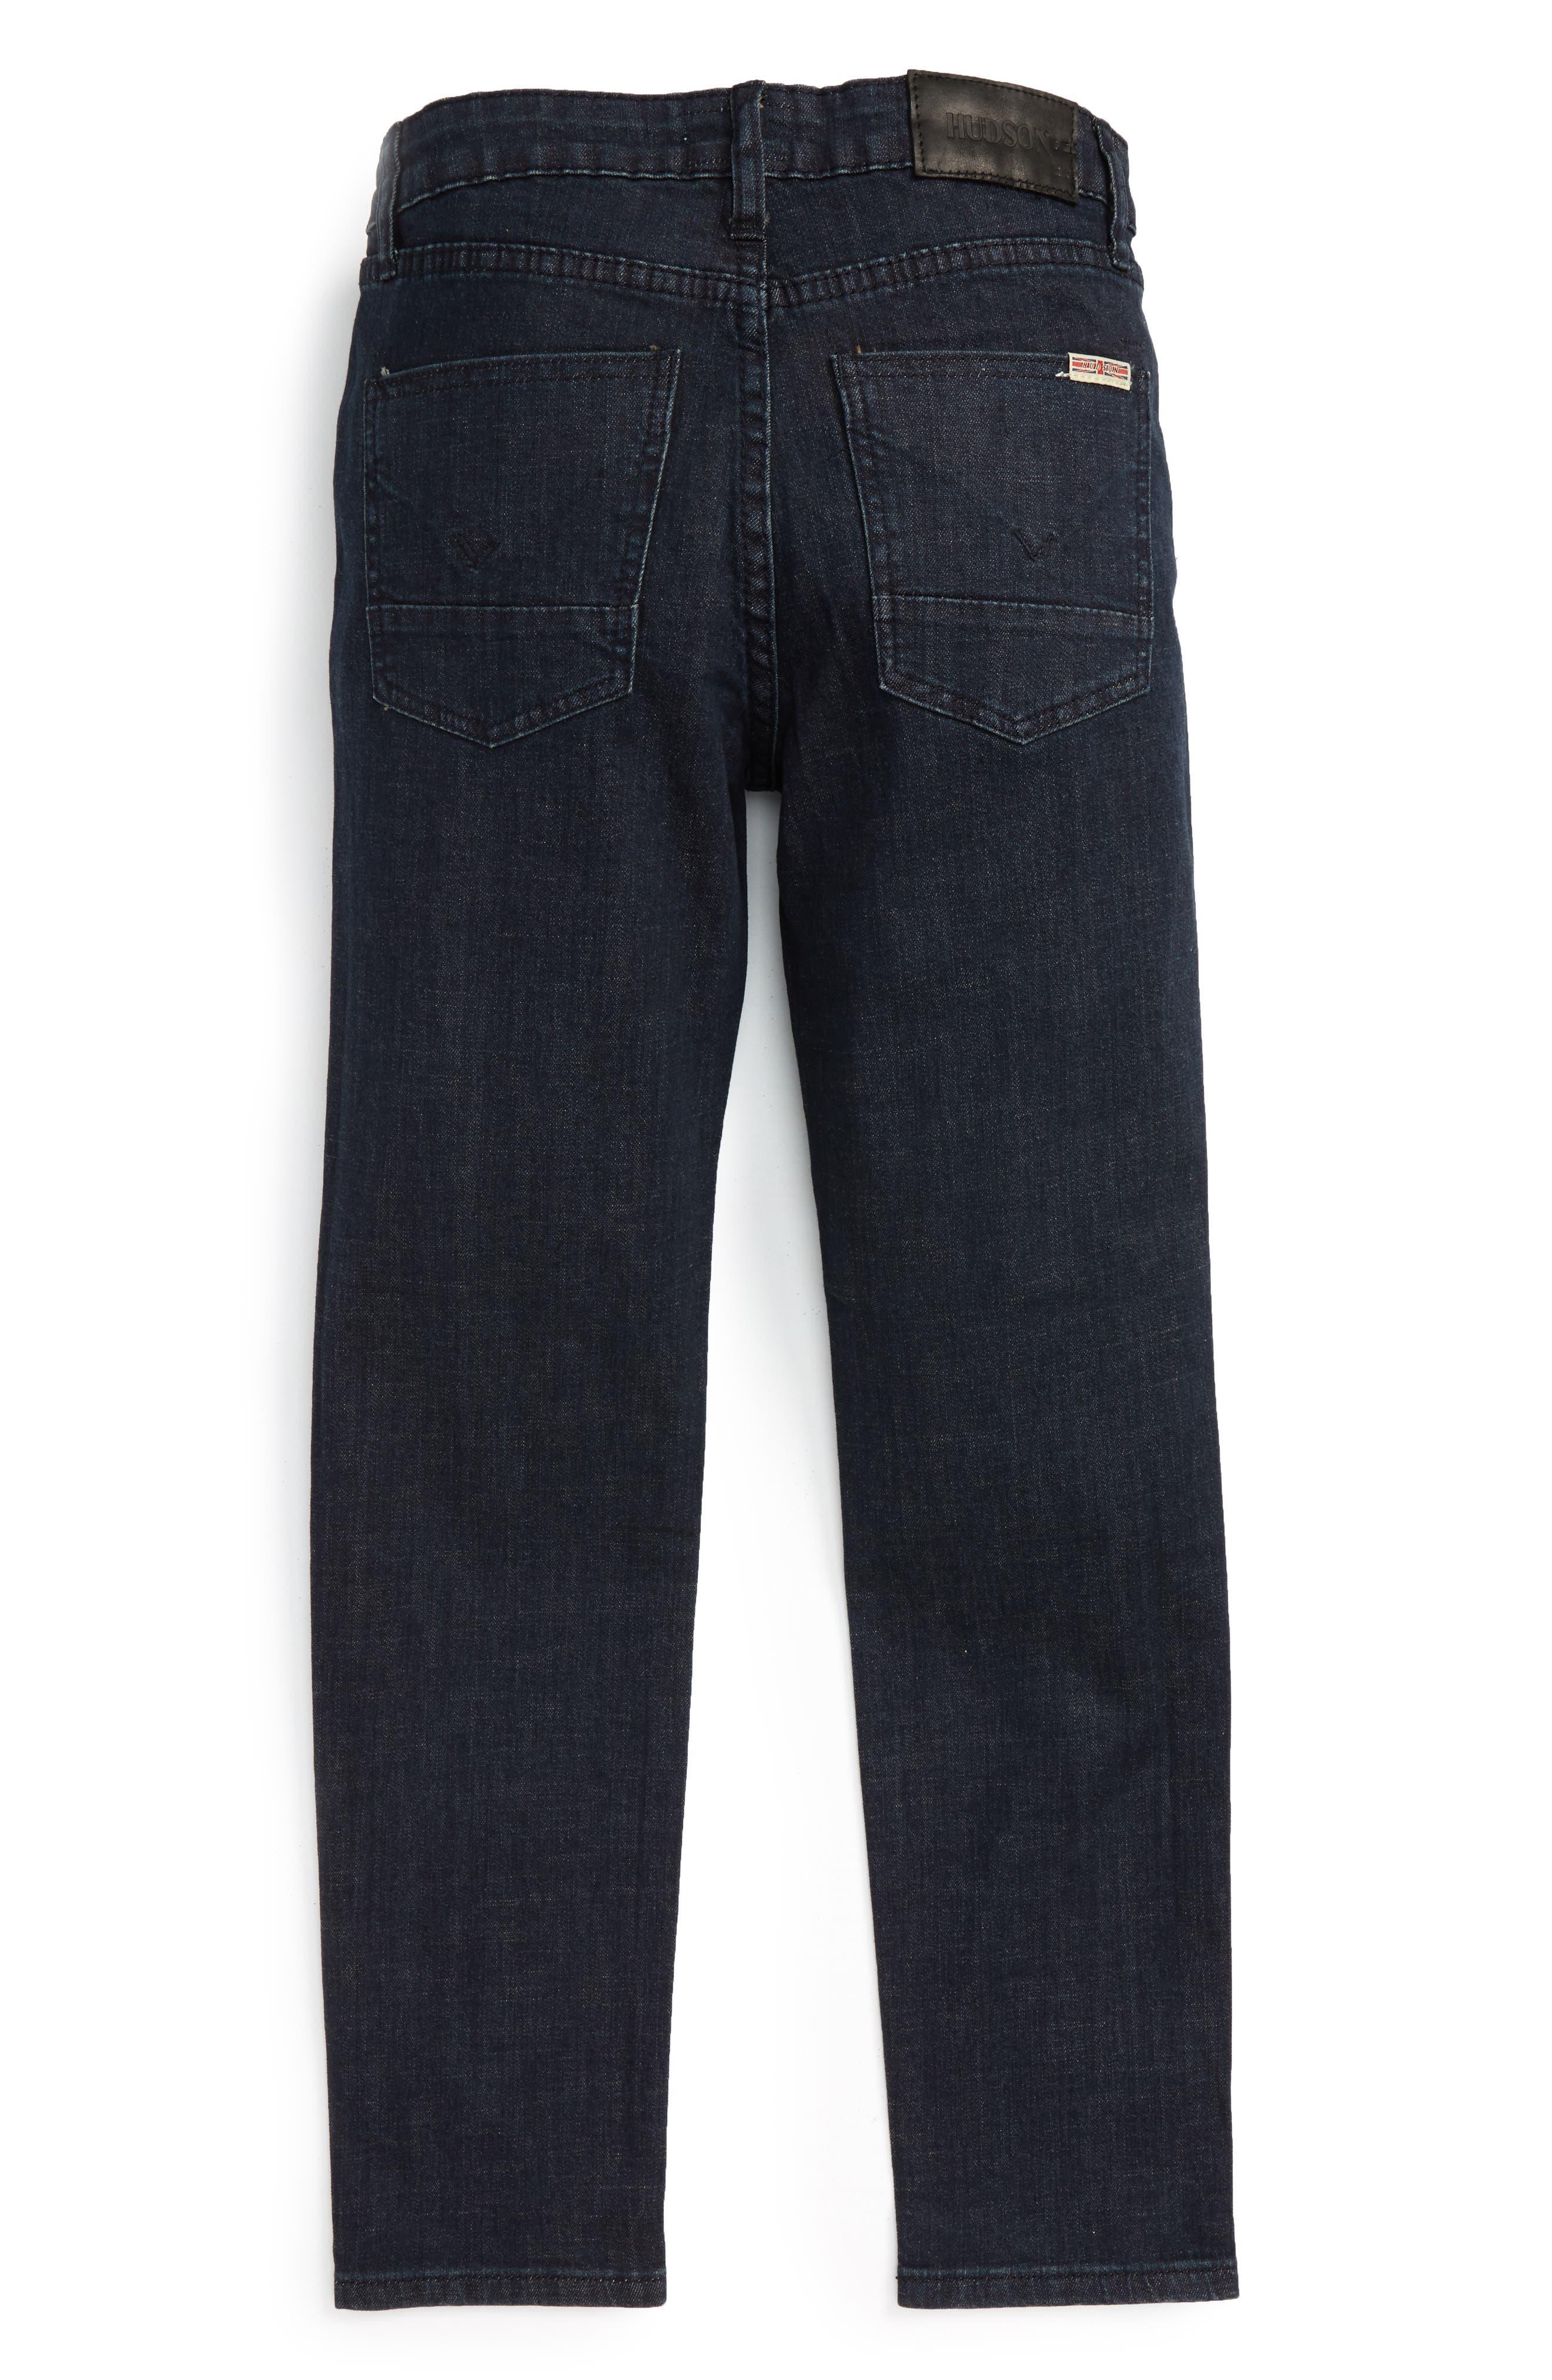 Jagger Slim Fit Straight Leg Jeans,                             Alternate thumbnail 7, color,